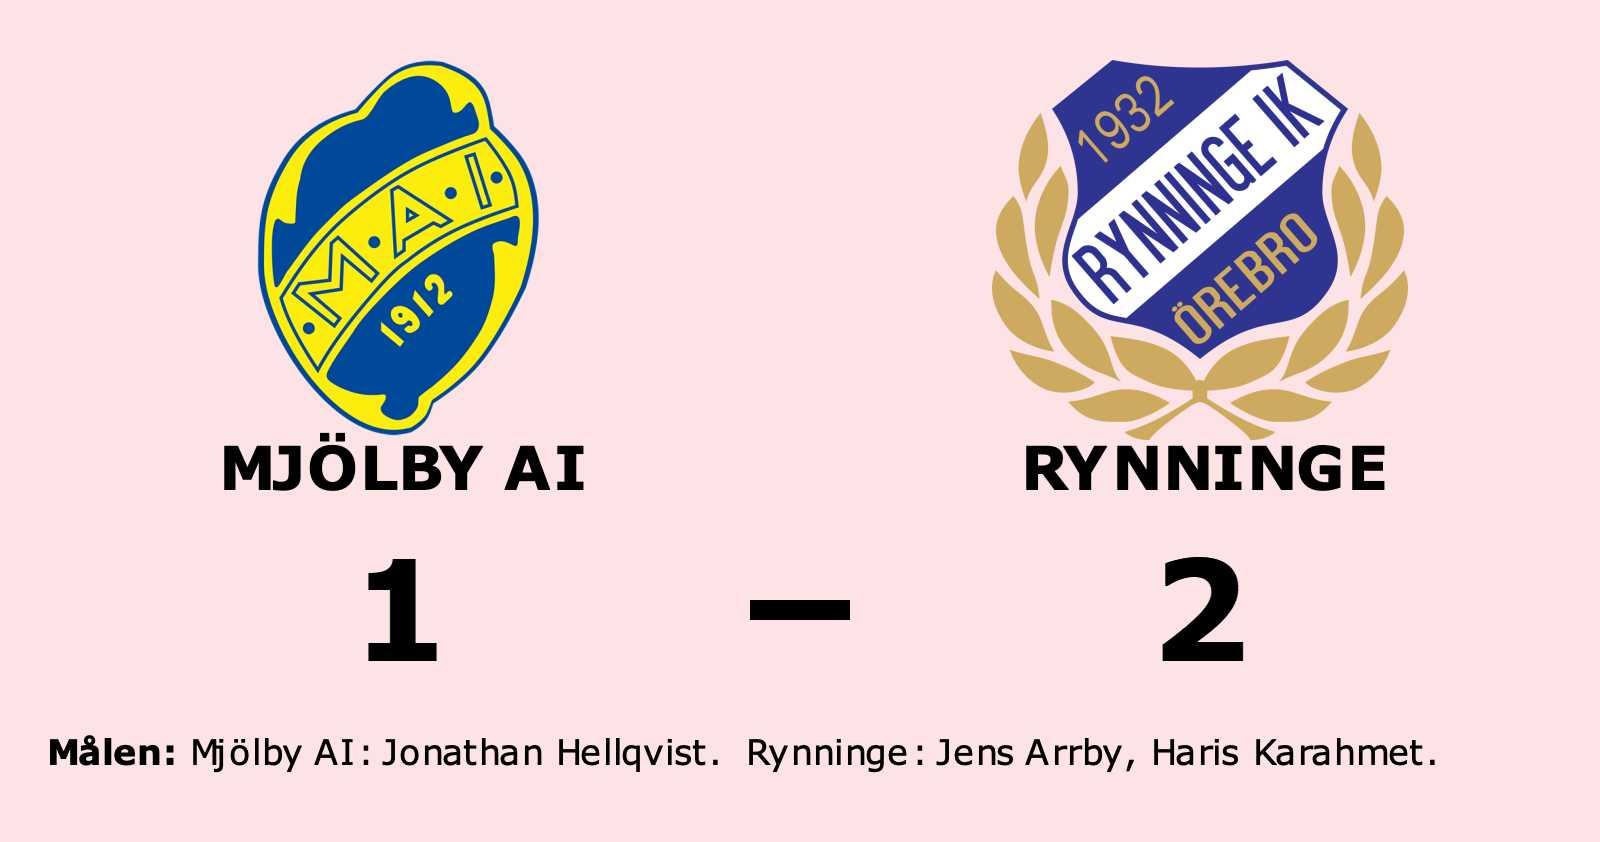 Jonathan Hellqvist enda målskytt när Mjölby AI föll